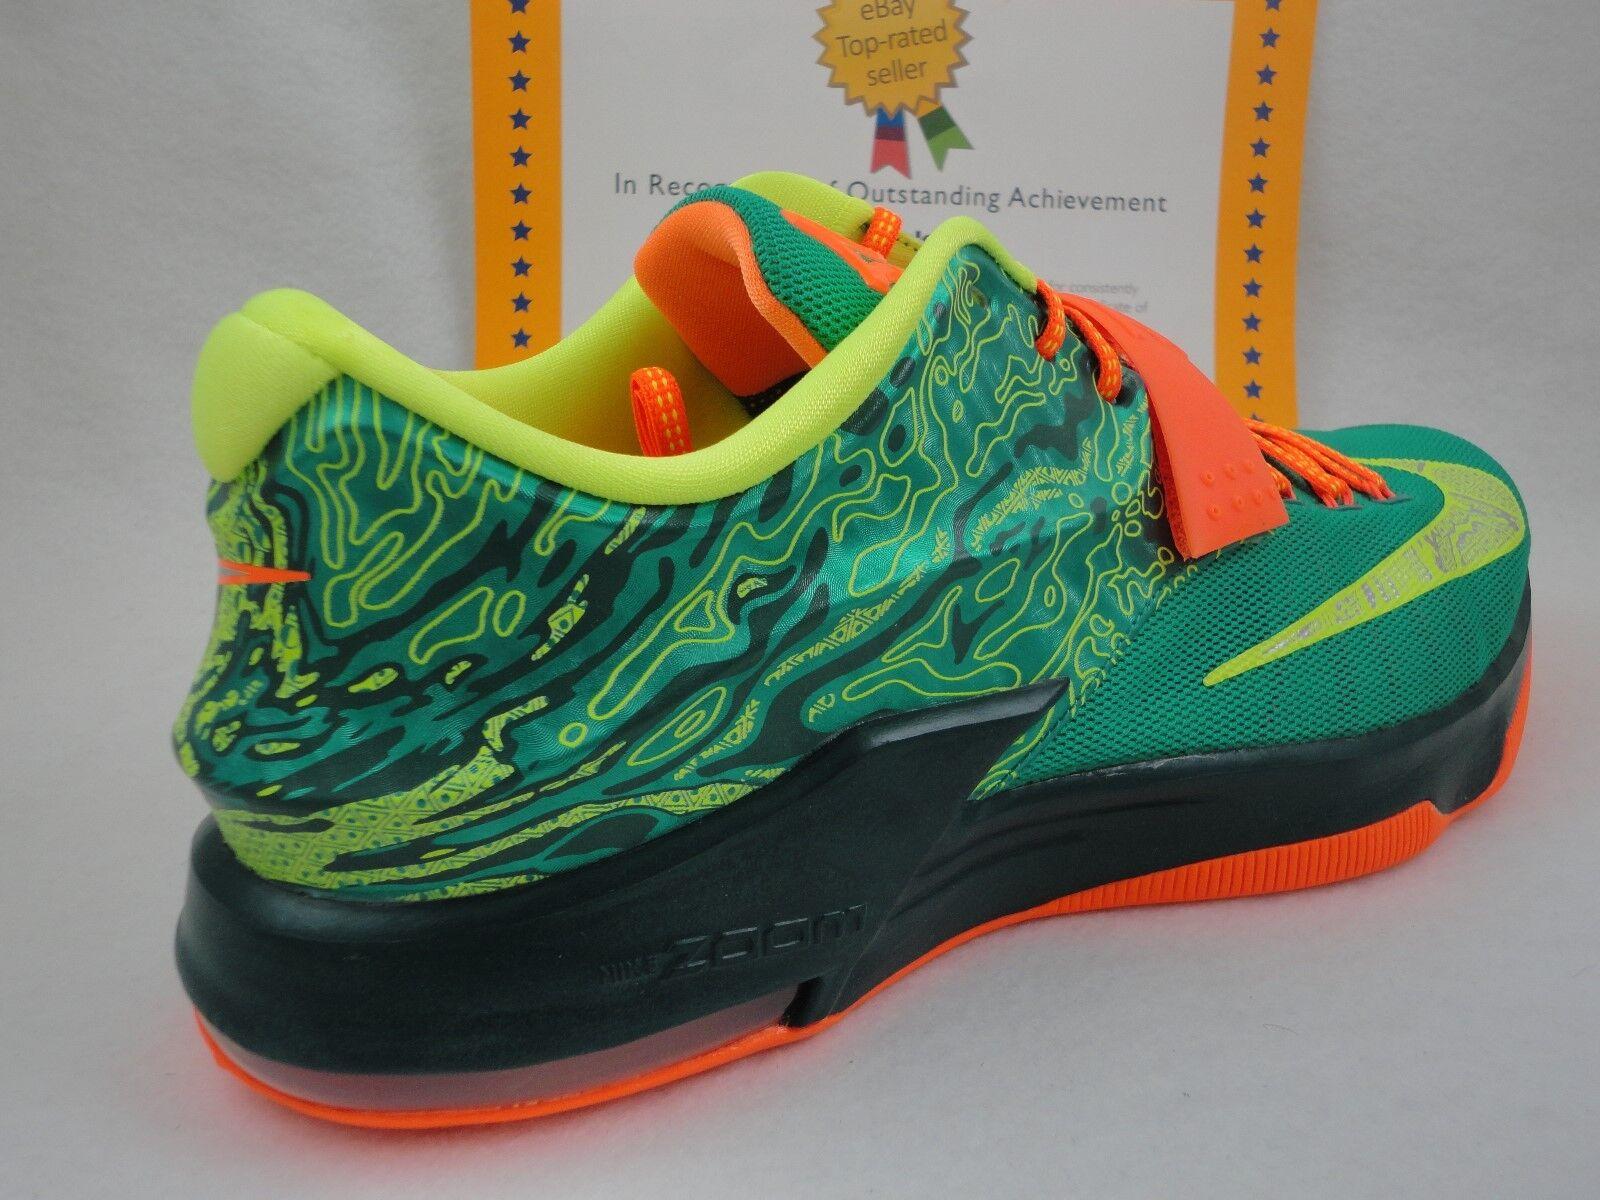 Nike KD VII 7, Weatherman, Emerald Green, Limited, Sz 13